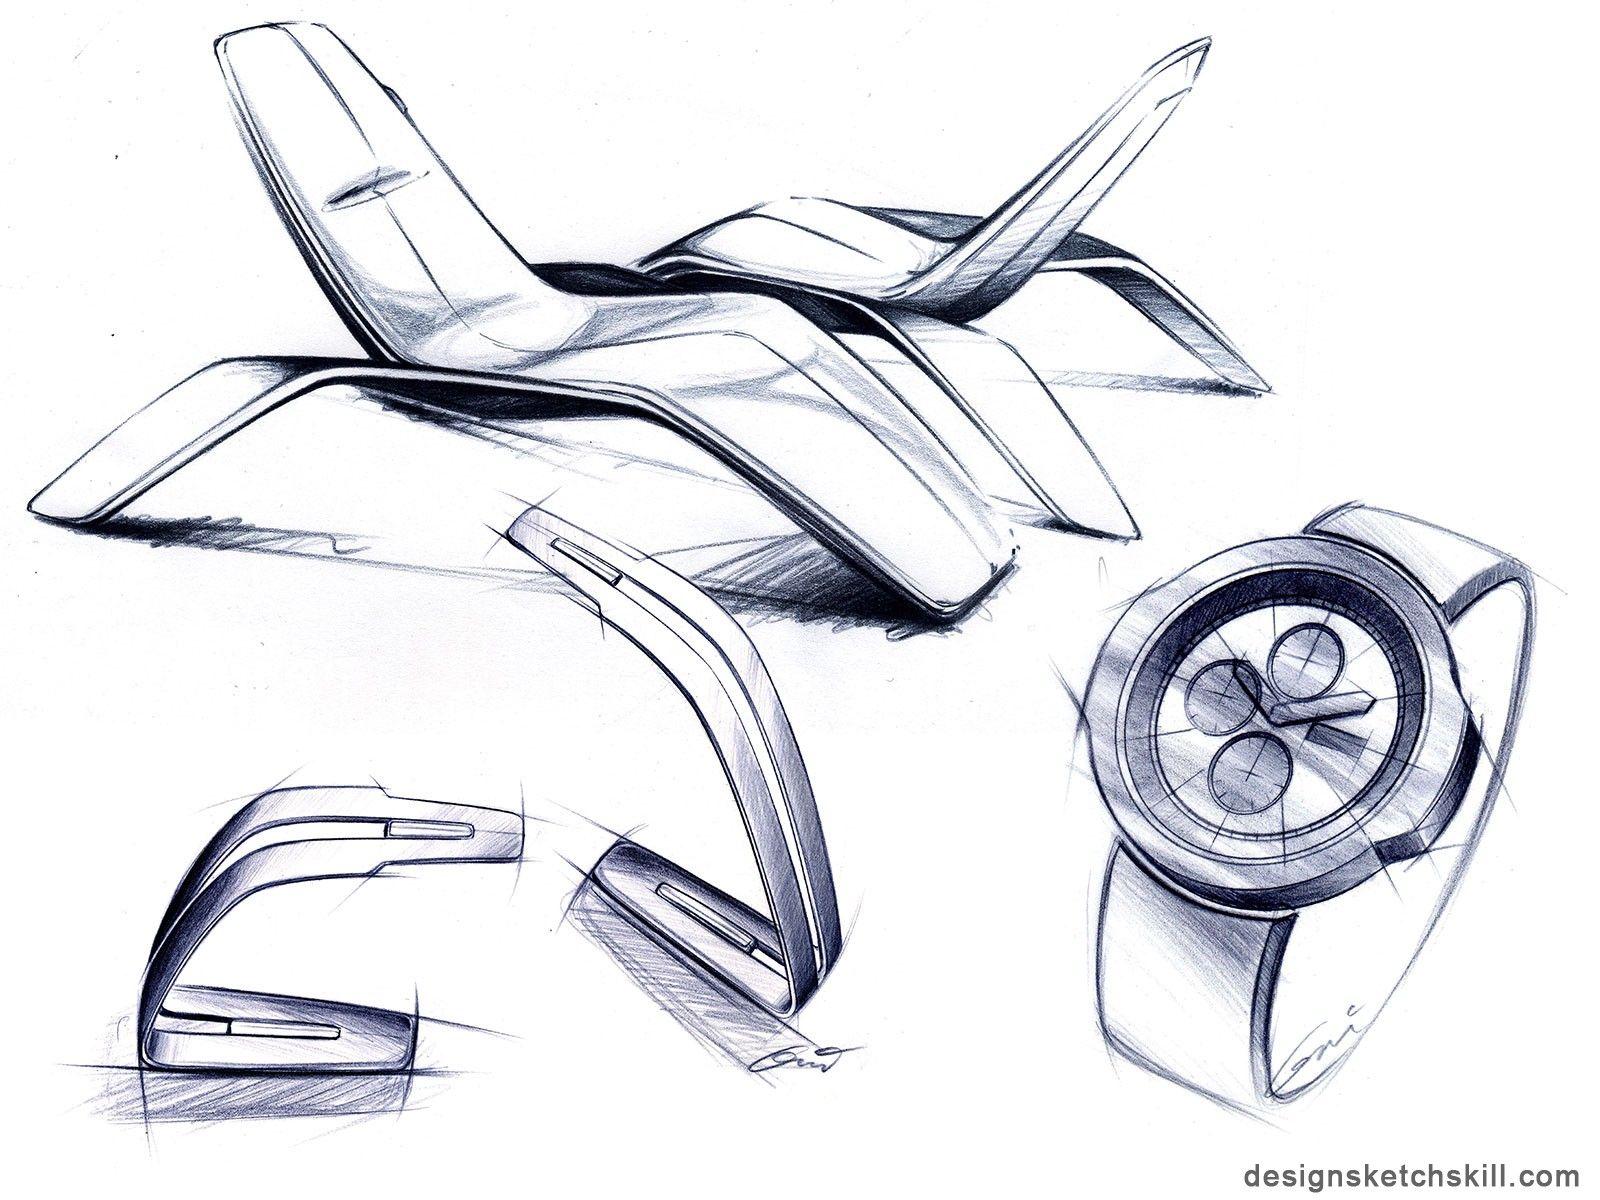 Industrial design sketches furniture - Sketches European Styleindustrial Designfurniture